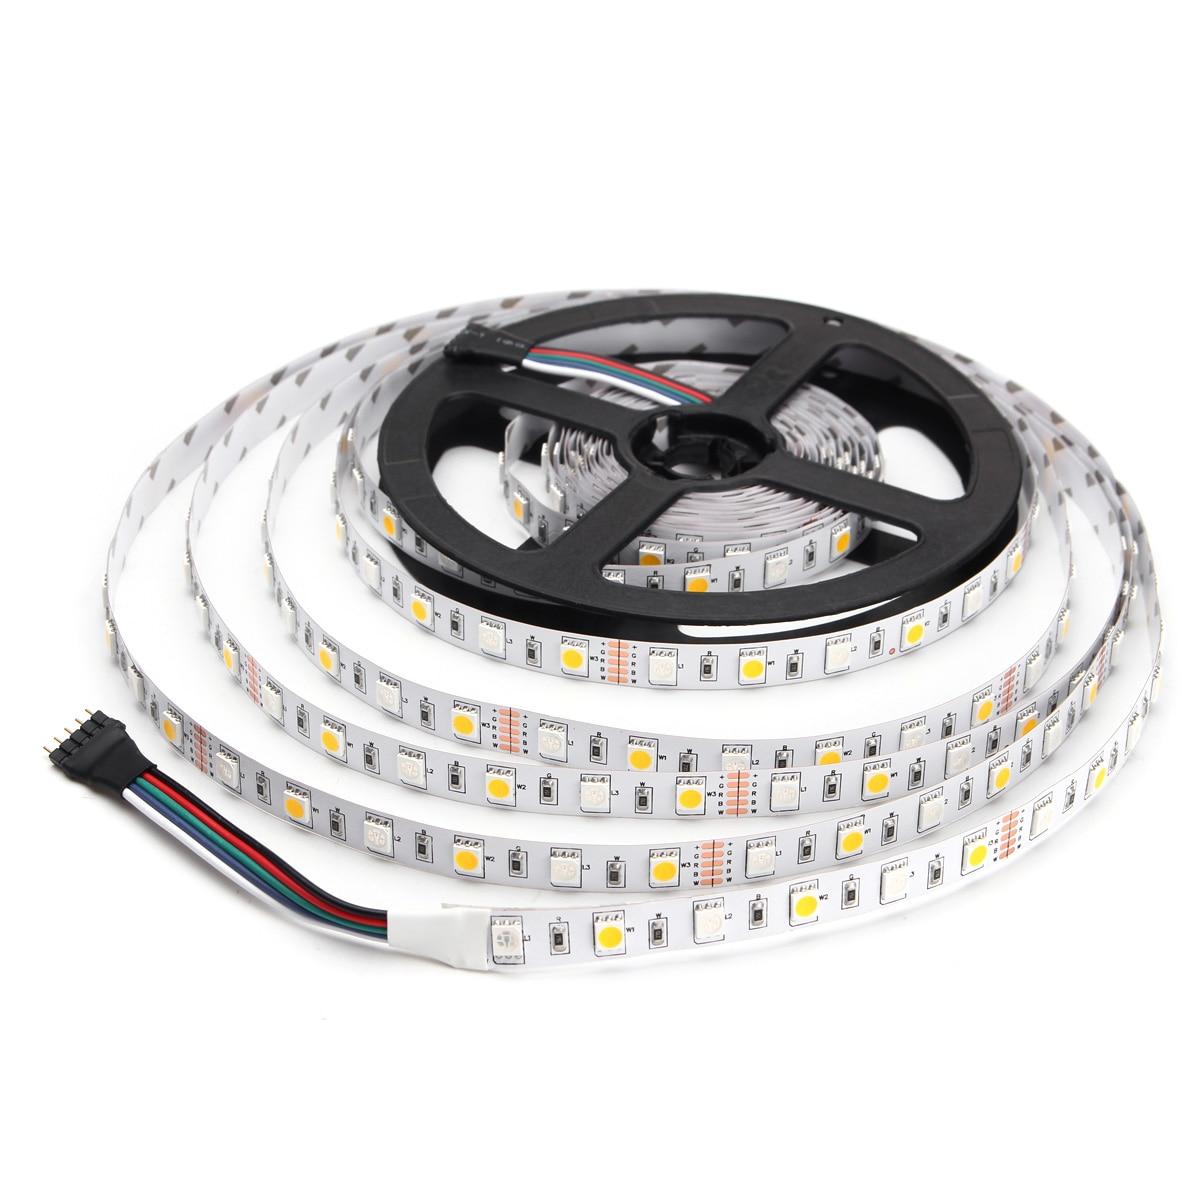 Smuxi 5M LED Strip 5050 RGBW DC 12V Flexible LED Light RGB + White / RGB + Warm White 60 LED/m Light No Waterproof недорго, оригинальная цена